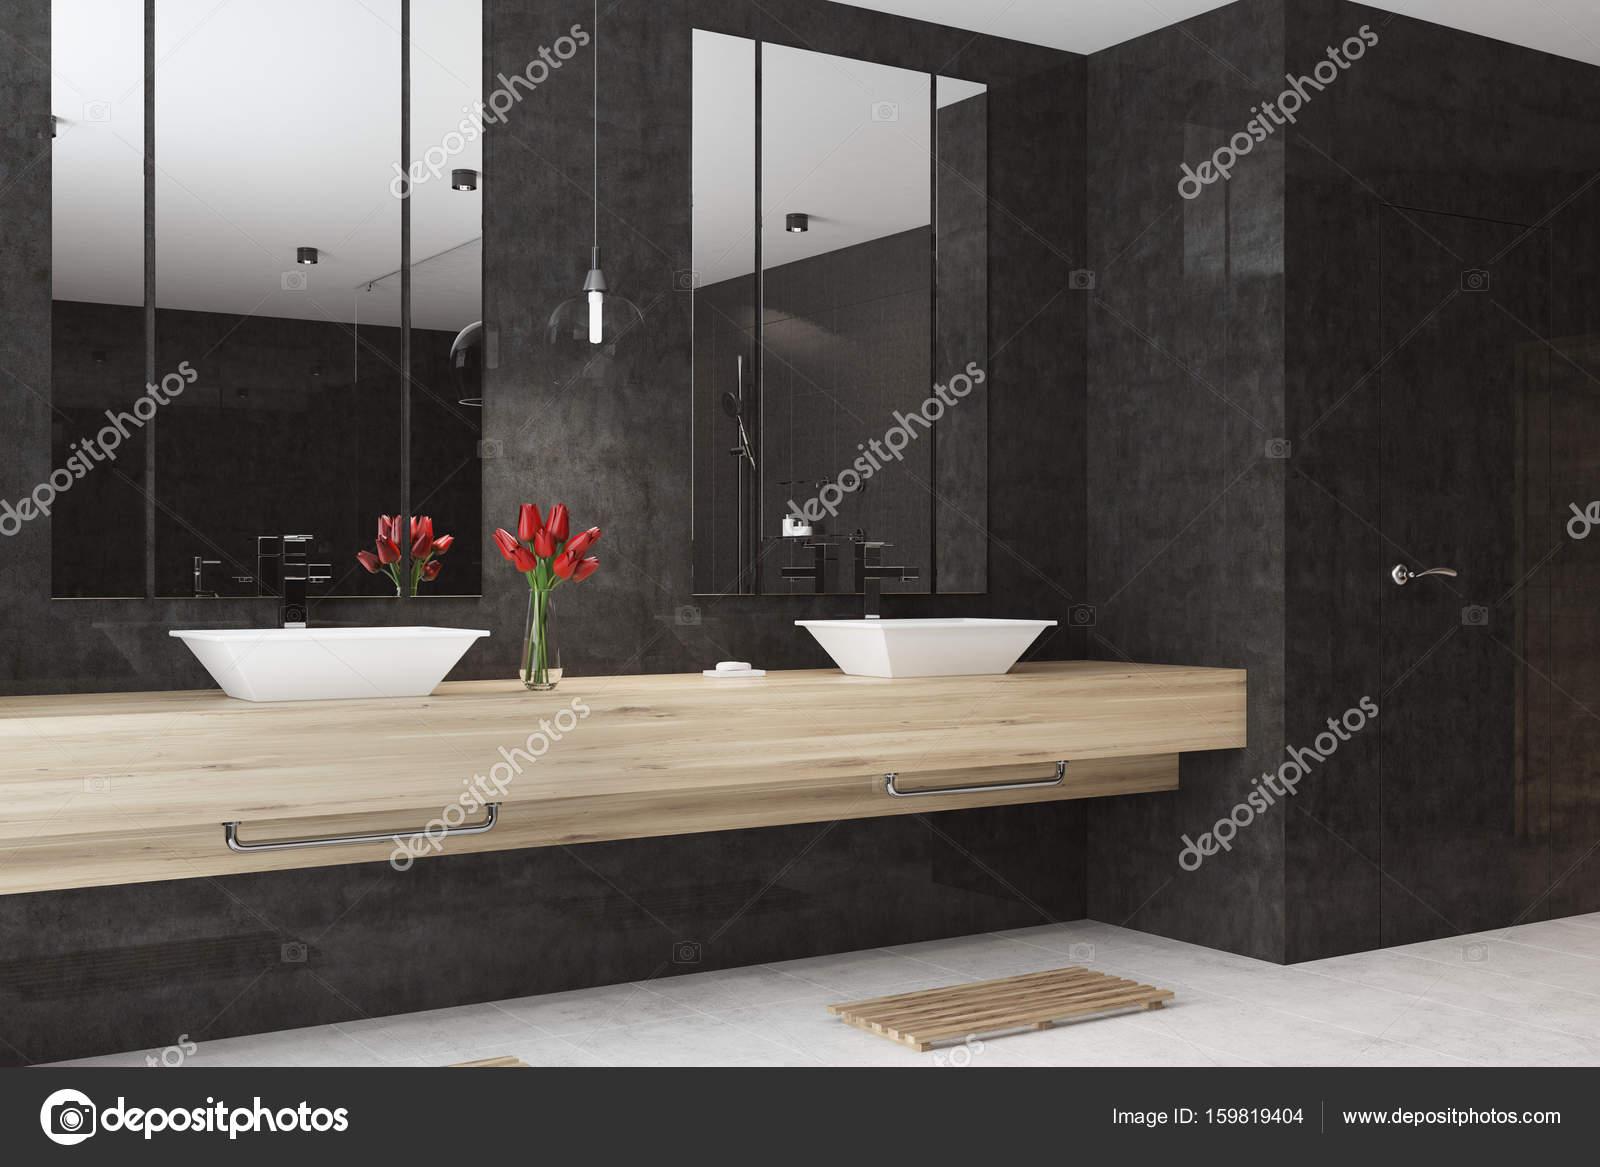 Zwarte badkamer interieur dubbele wastafel hoek u2014 stockfoto